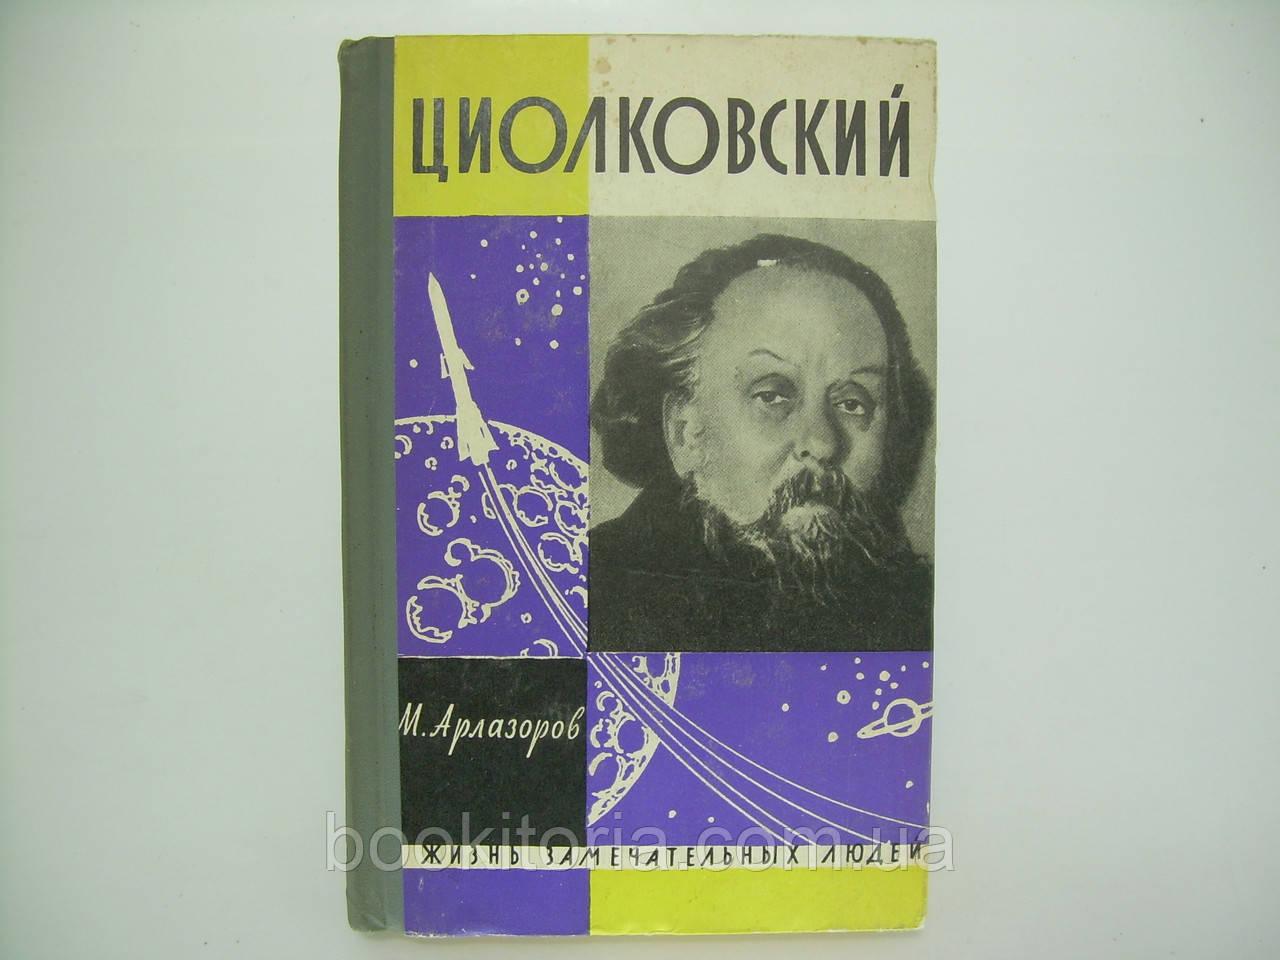 Арлазоров М. Циолковский (б/у).